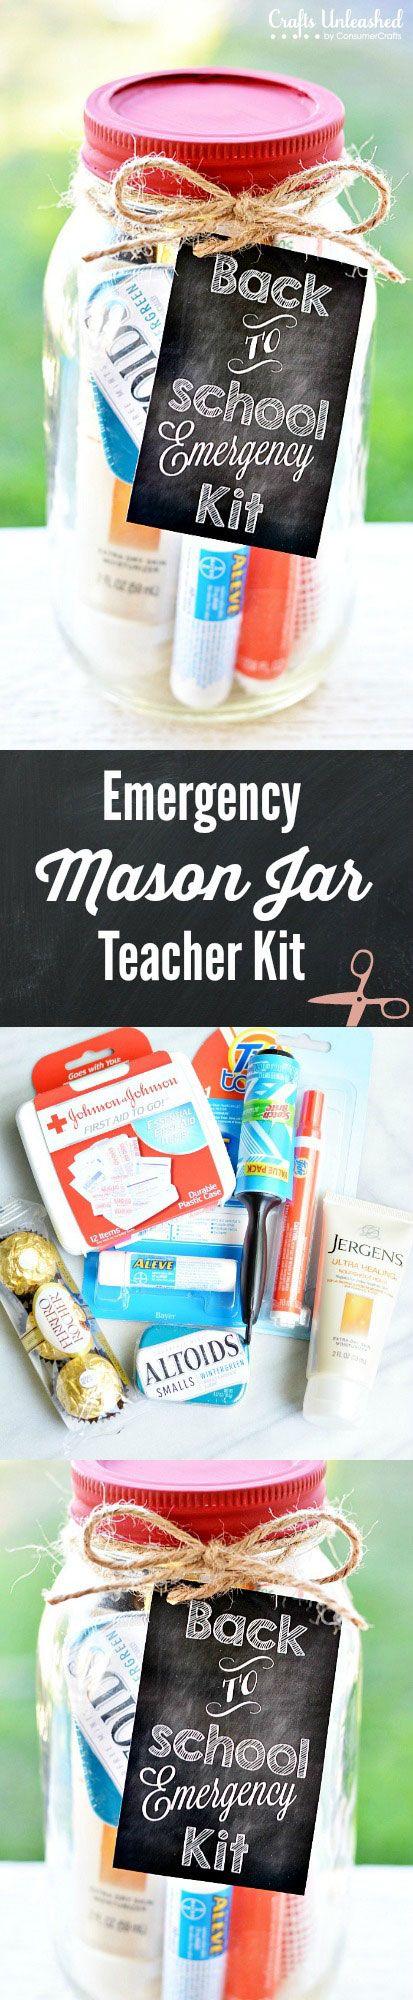 Emergency Mason Jar Teacher Kit